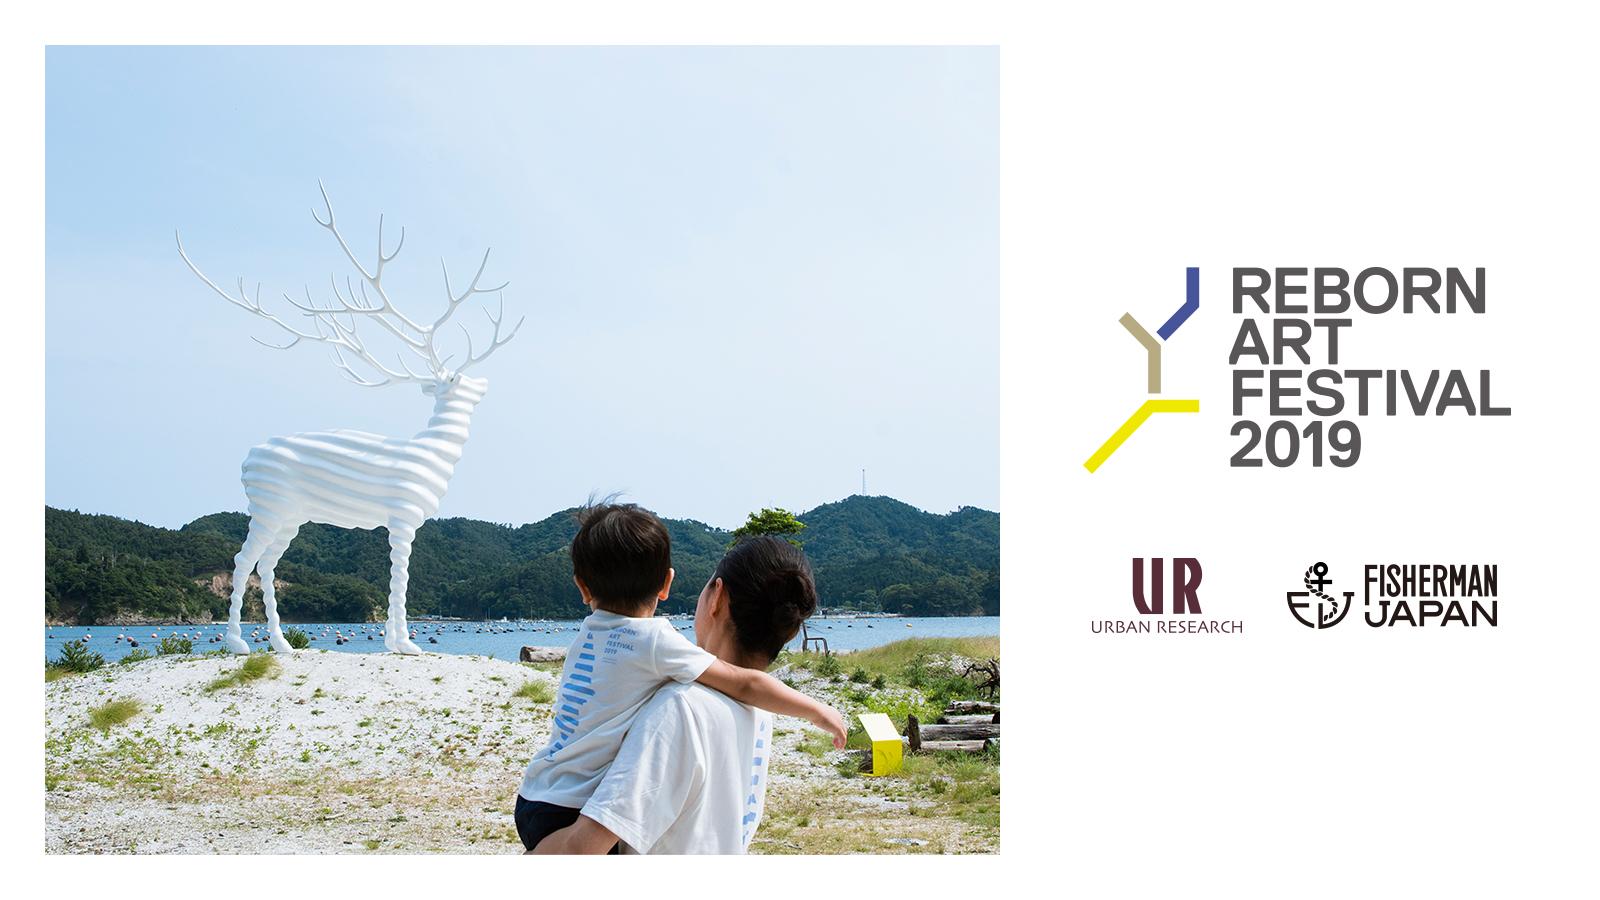 Reborn-Art Festival 2019 × URBAN RESEARCH × FISHERMAN JAPAN